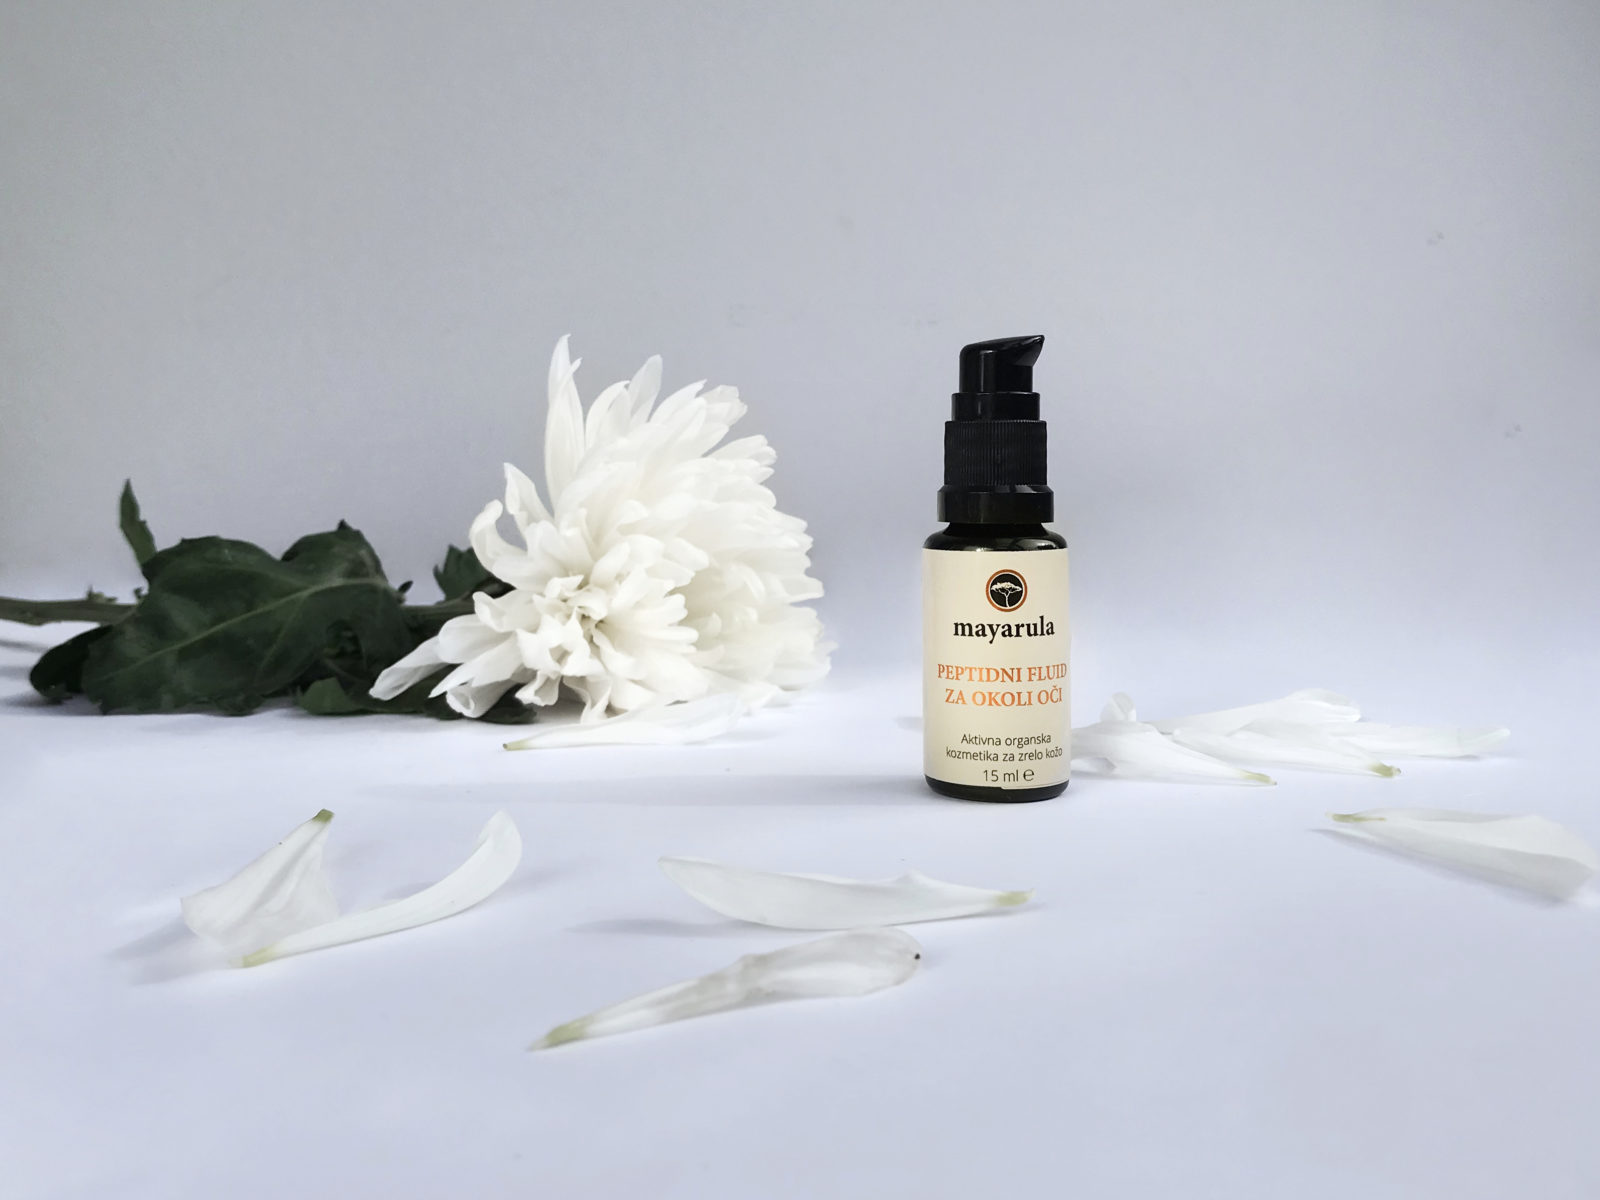 Mayarula peptidni fluid krema oči nika veger beautyfull blog